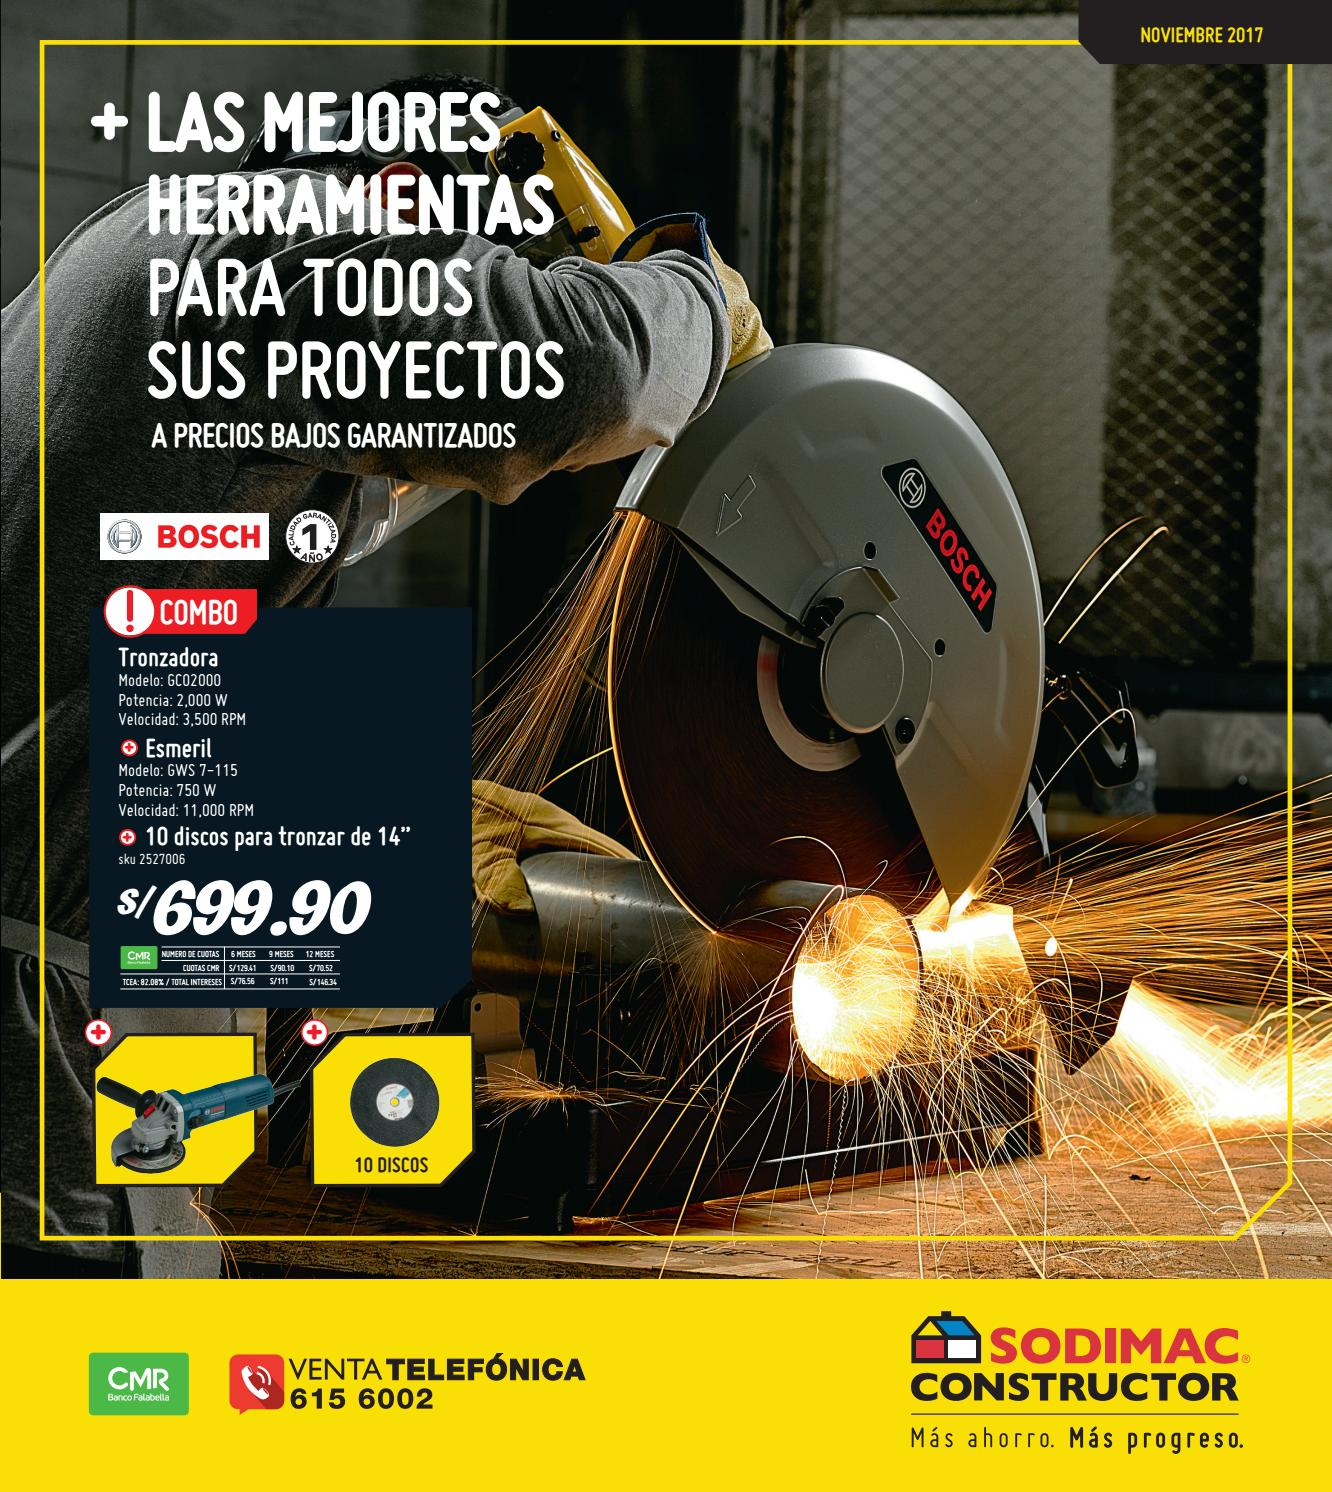 Especial herramientas diciembre by hctr.441 - issuu 430d77797d05